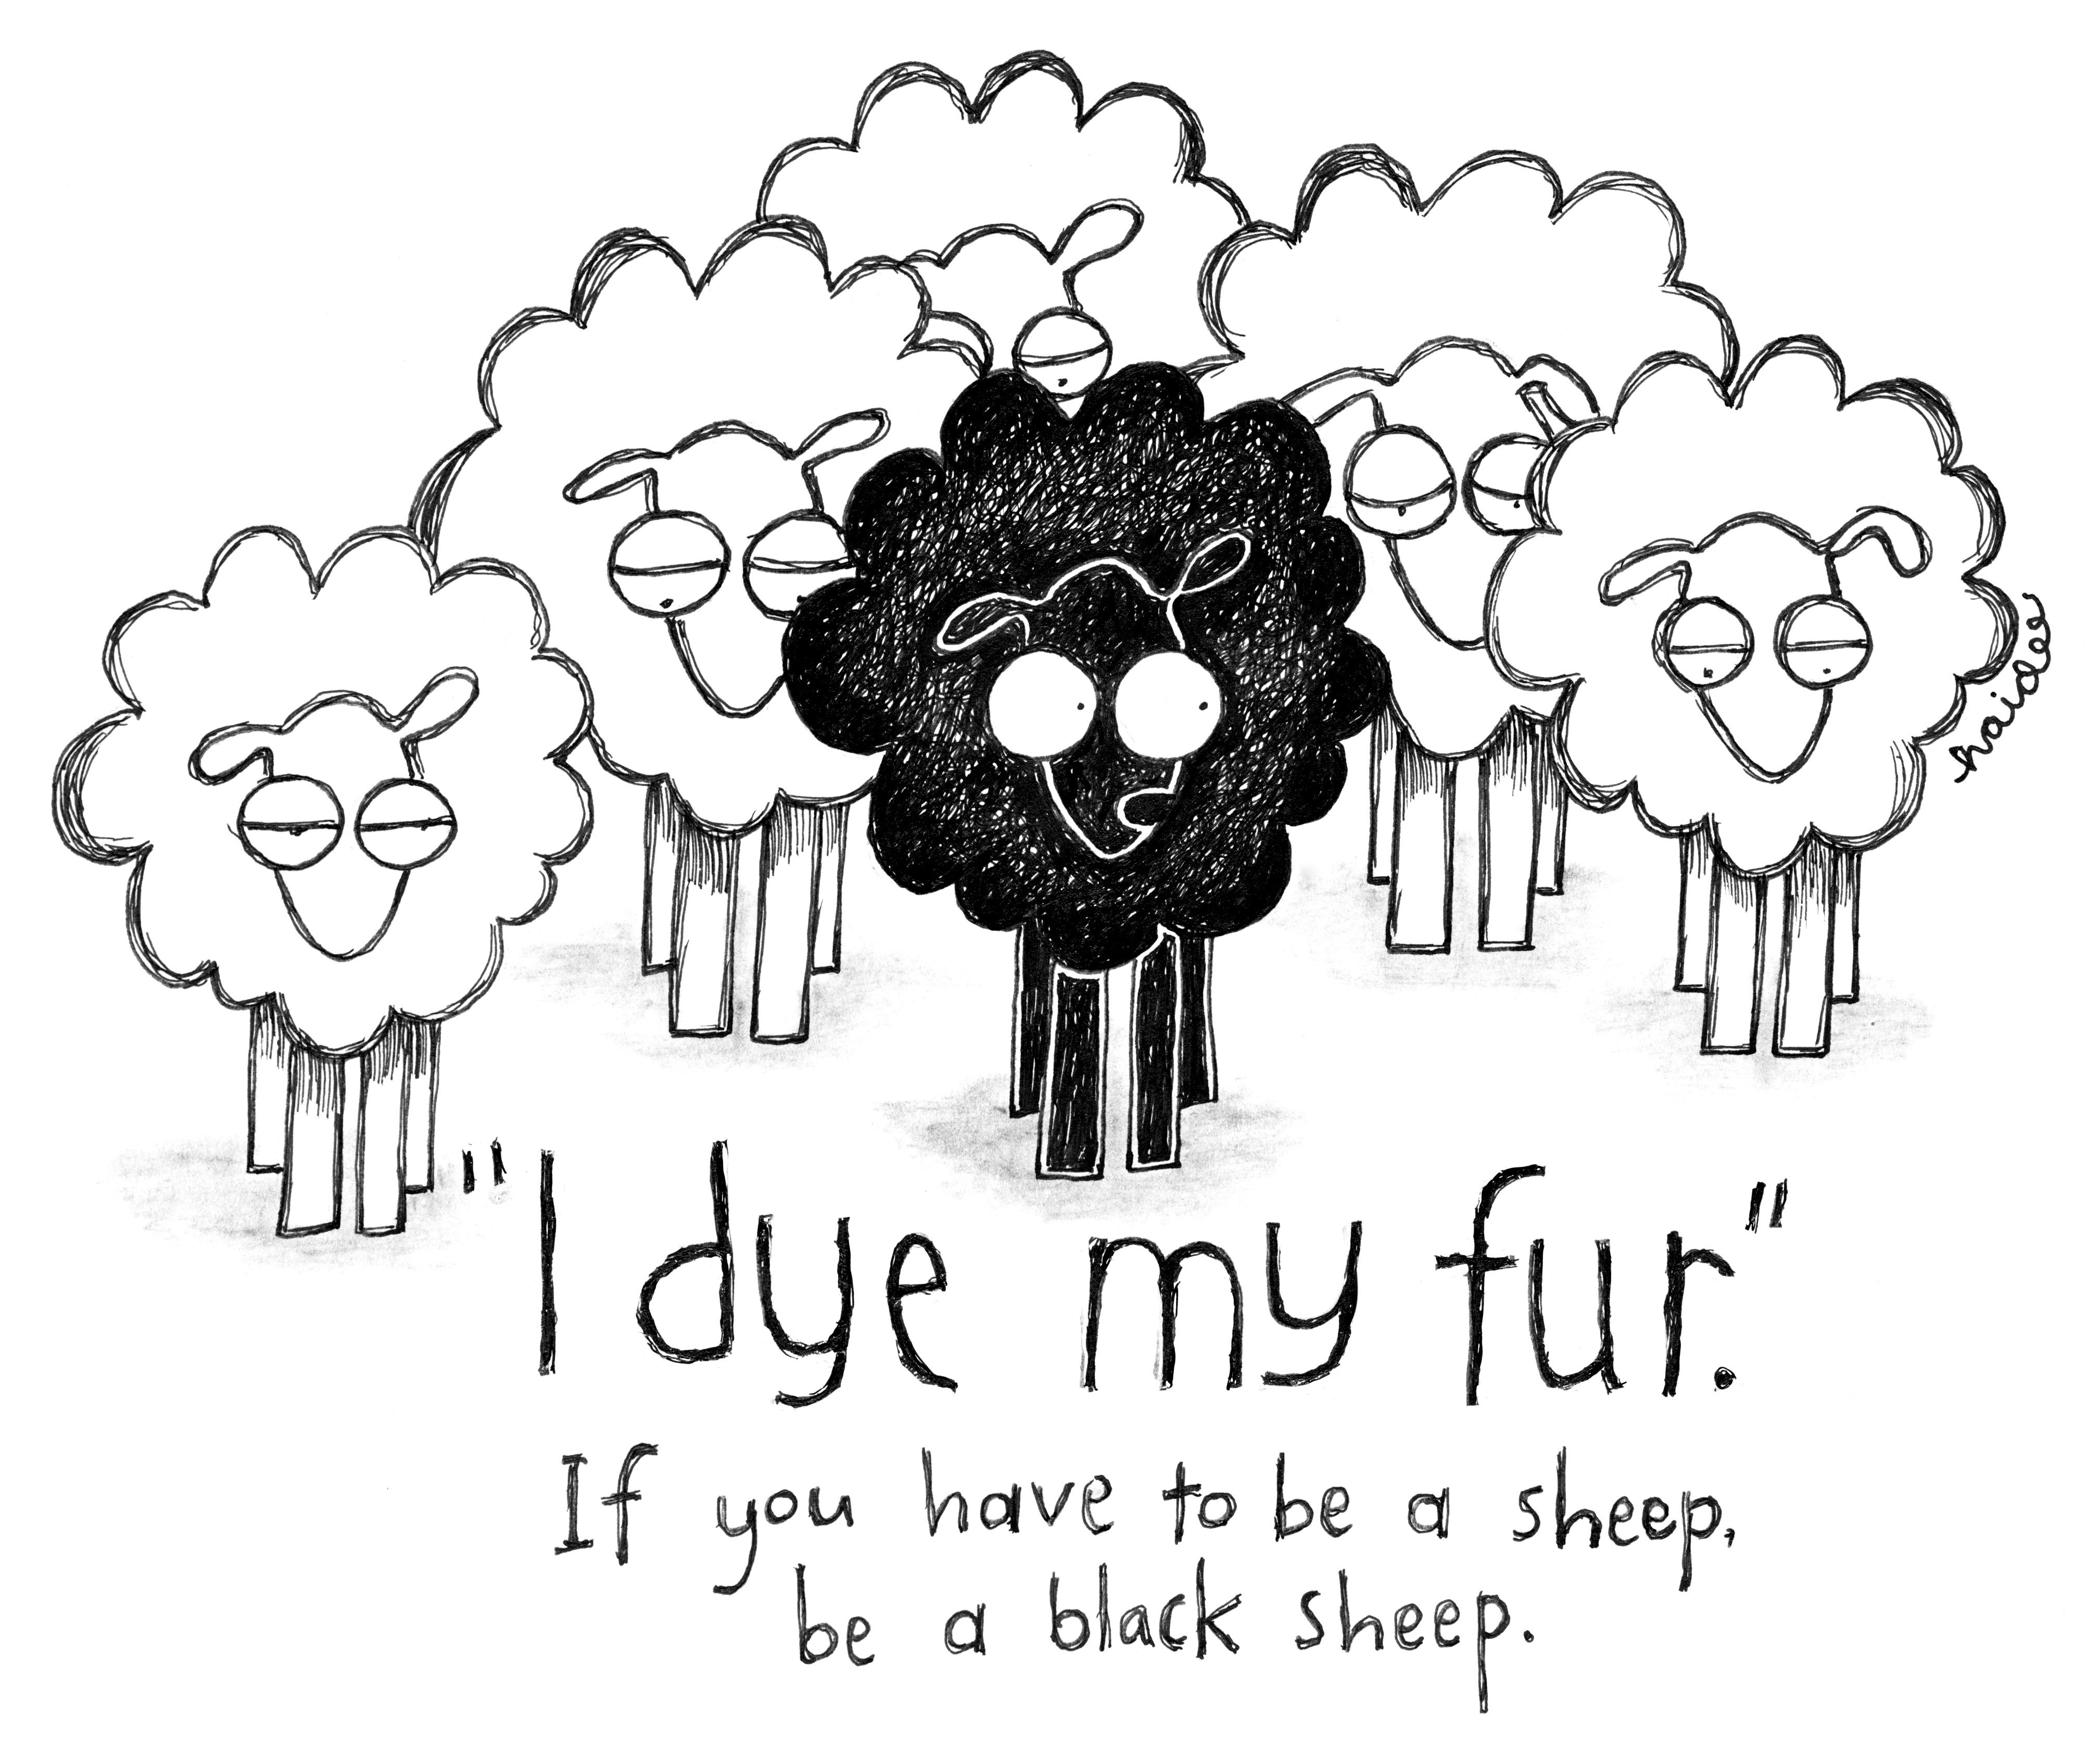 4034x3367 One Sheep, Two Sheep Haidee Merritt